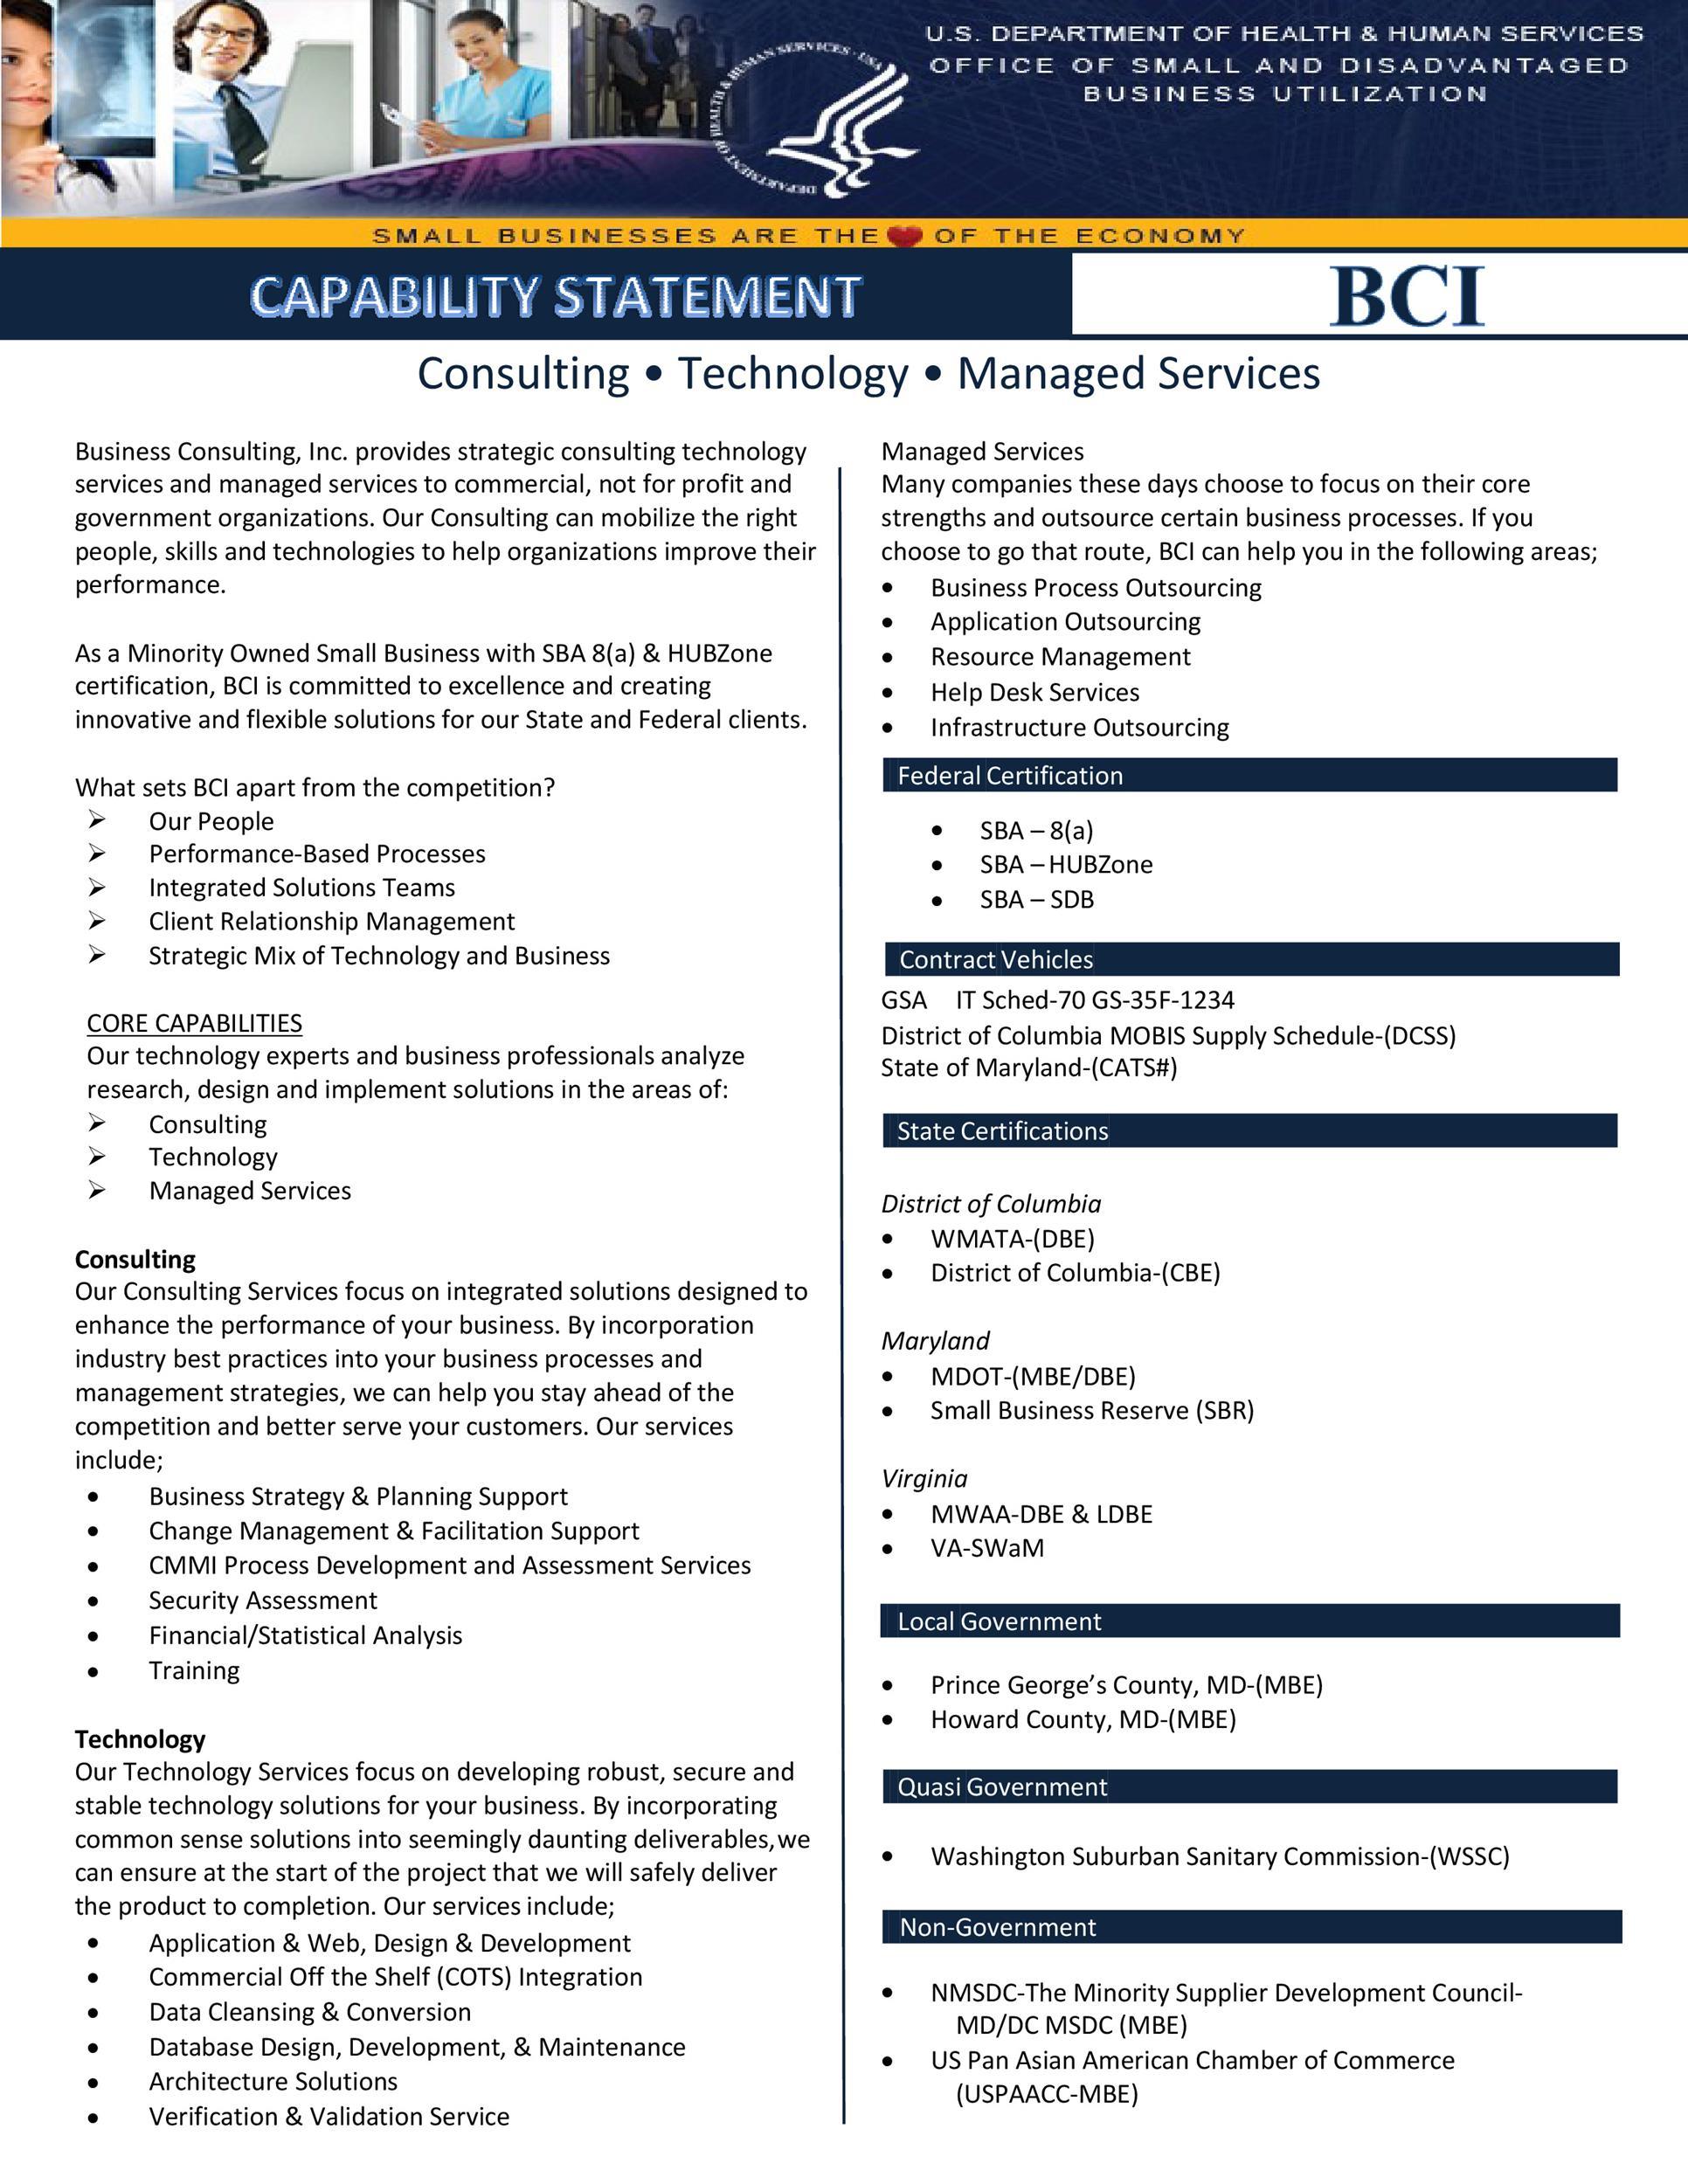 Free capability statement 21